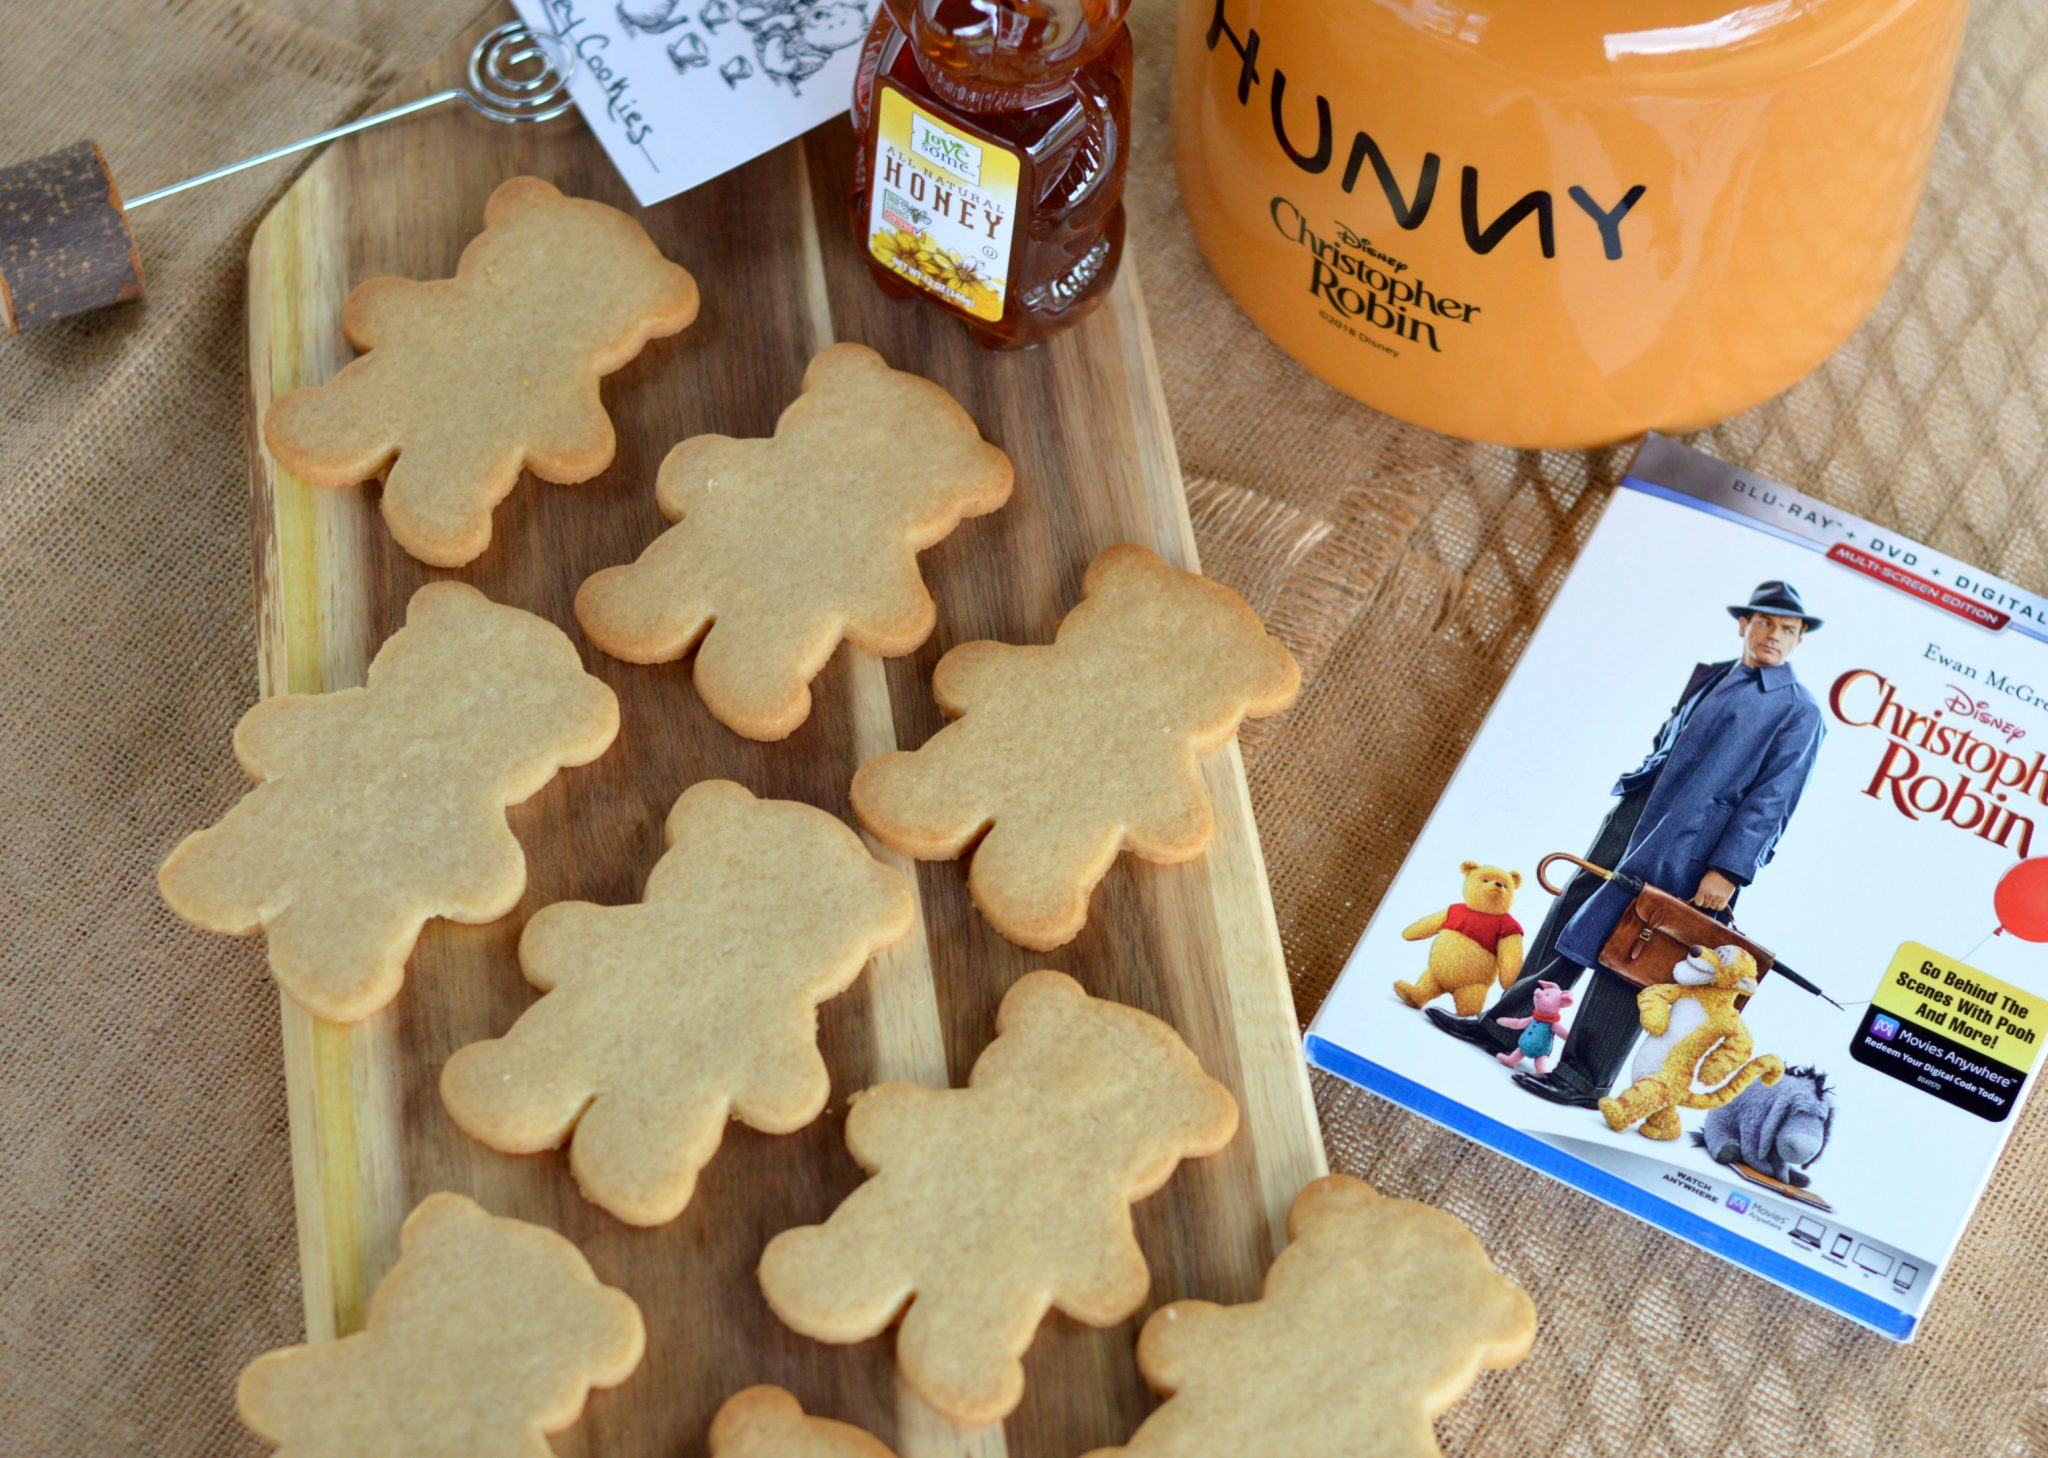 Honey Cookie Recipe: Disney's Christopher Robin On Bluray